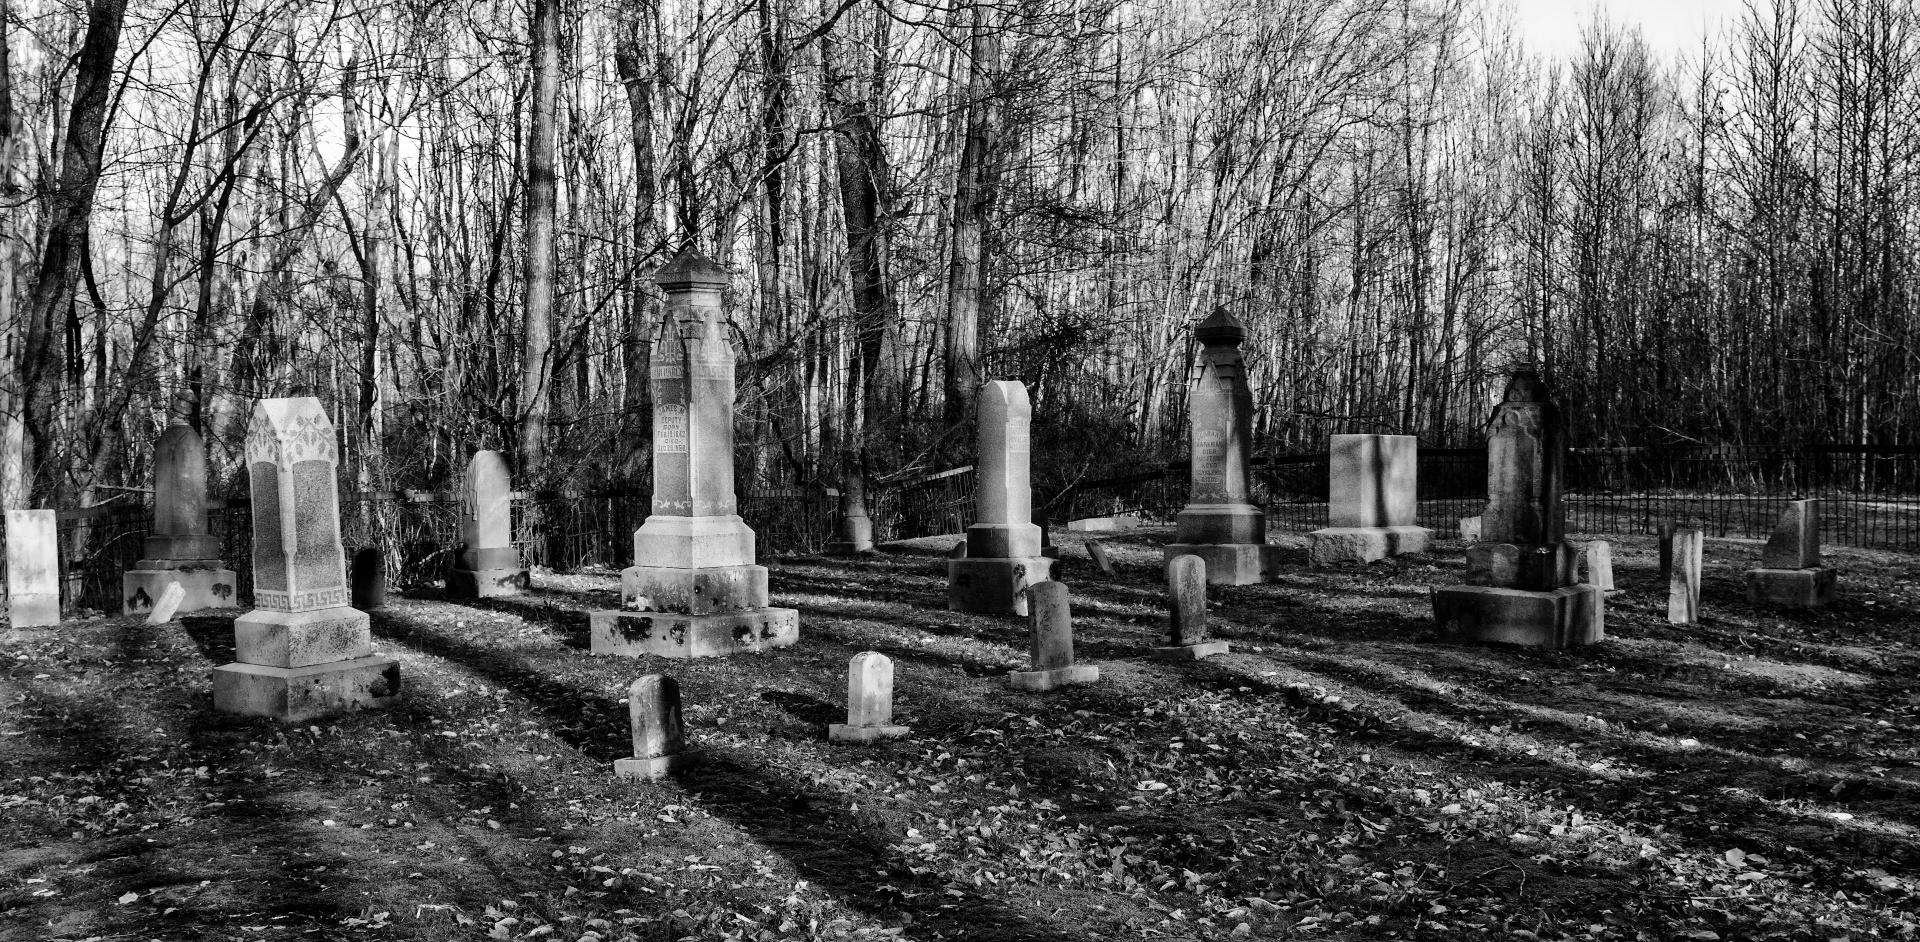 https://i2.wp.com/www.publicdomainpictures.net/pictures/210000/velka/barkman-cemetery.jpg